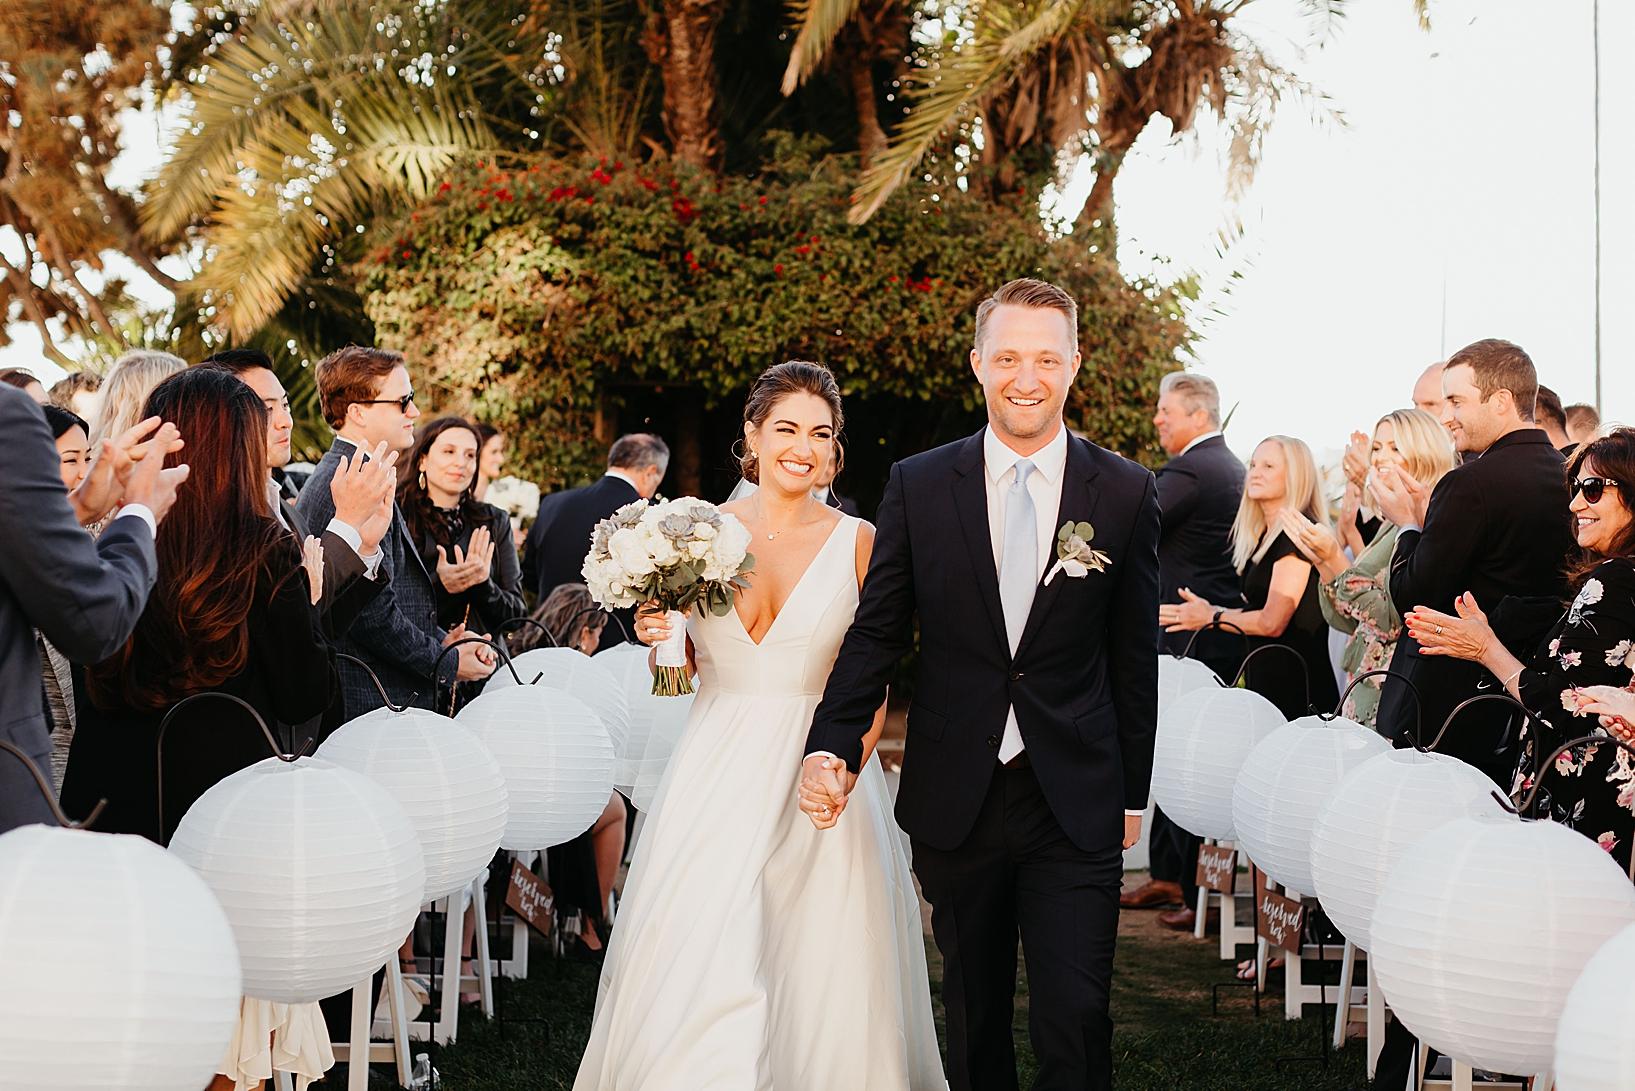 Herb-and-Wood-Wedding-46.jpg